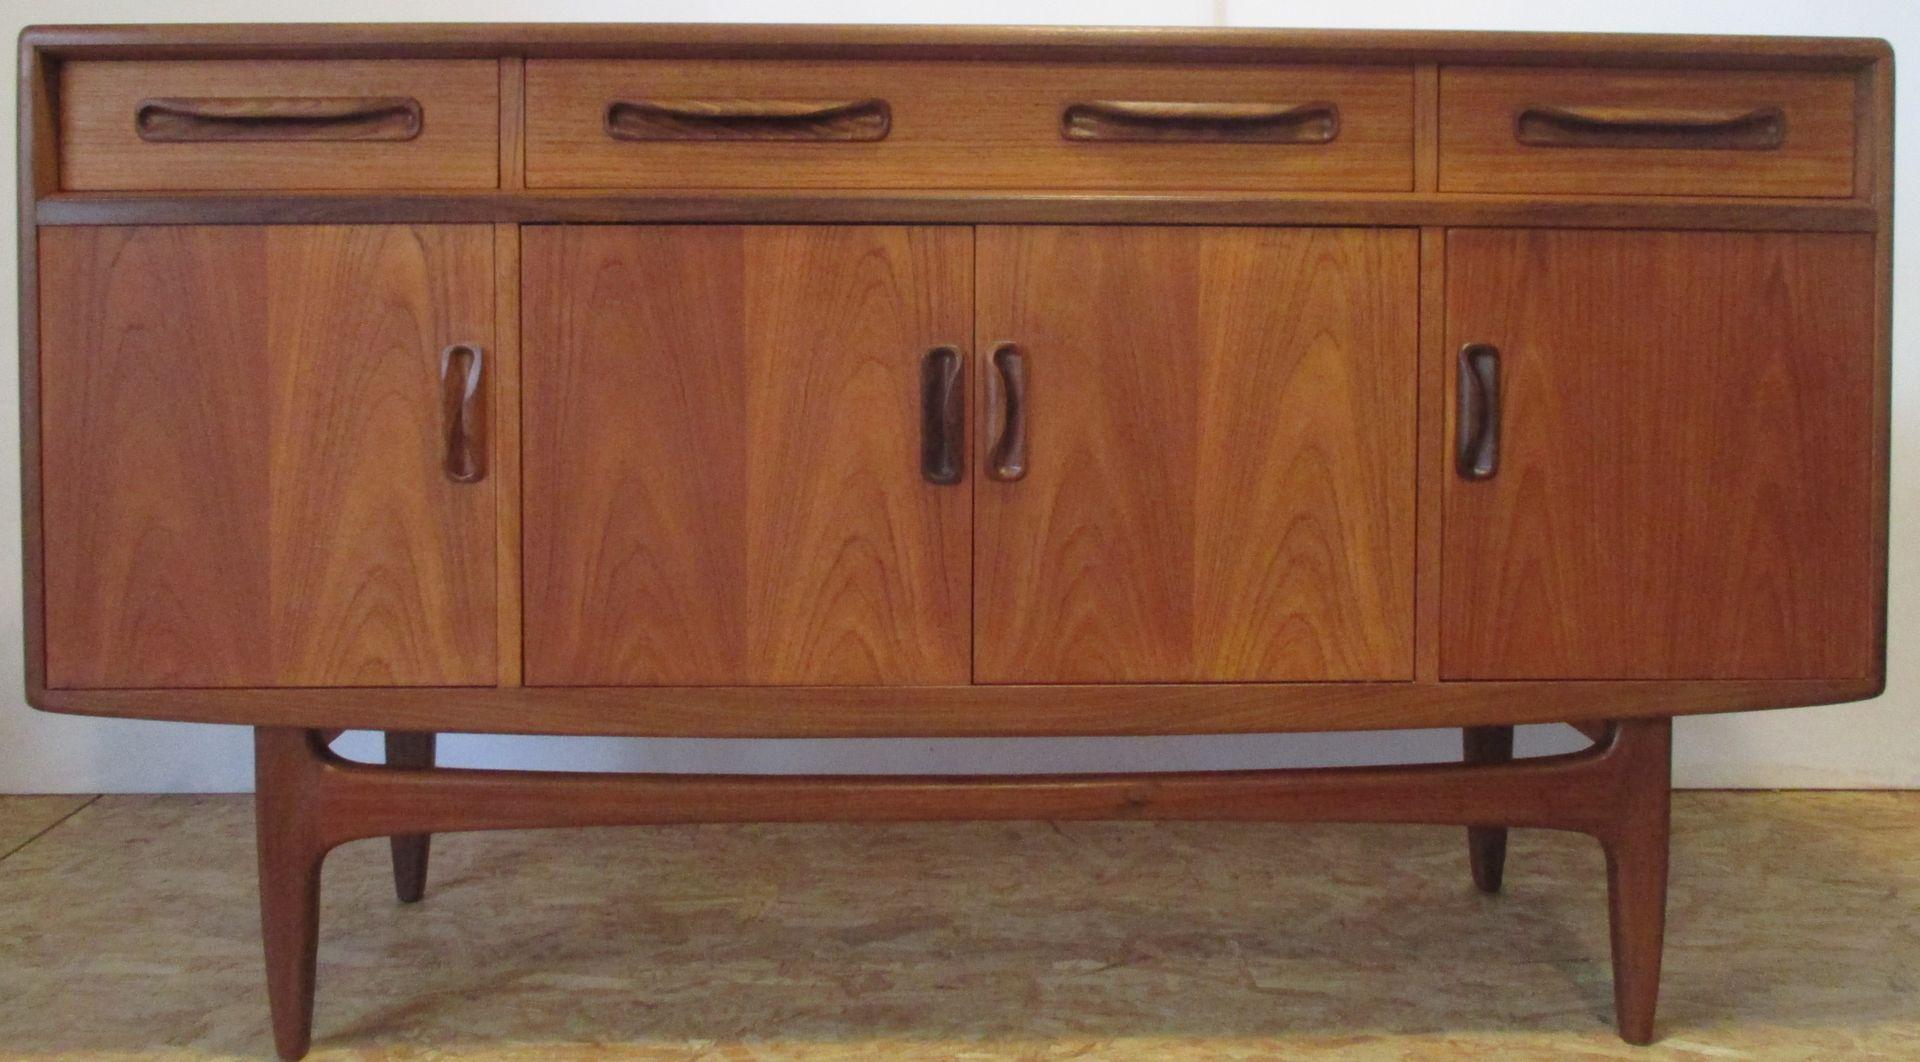 kleines vintage teak sideboard von g plan 1970er bei. Black Bedroom Furniture Sets. Home Design Ideas